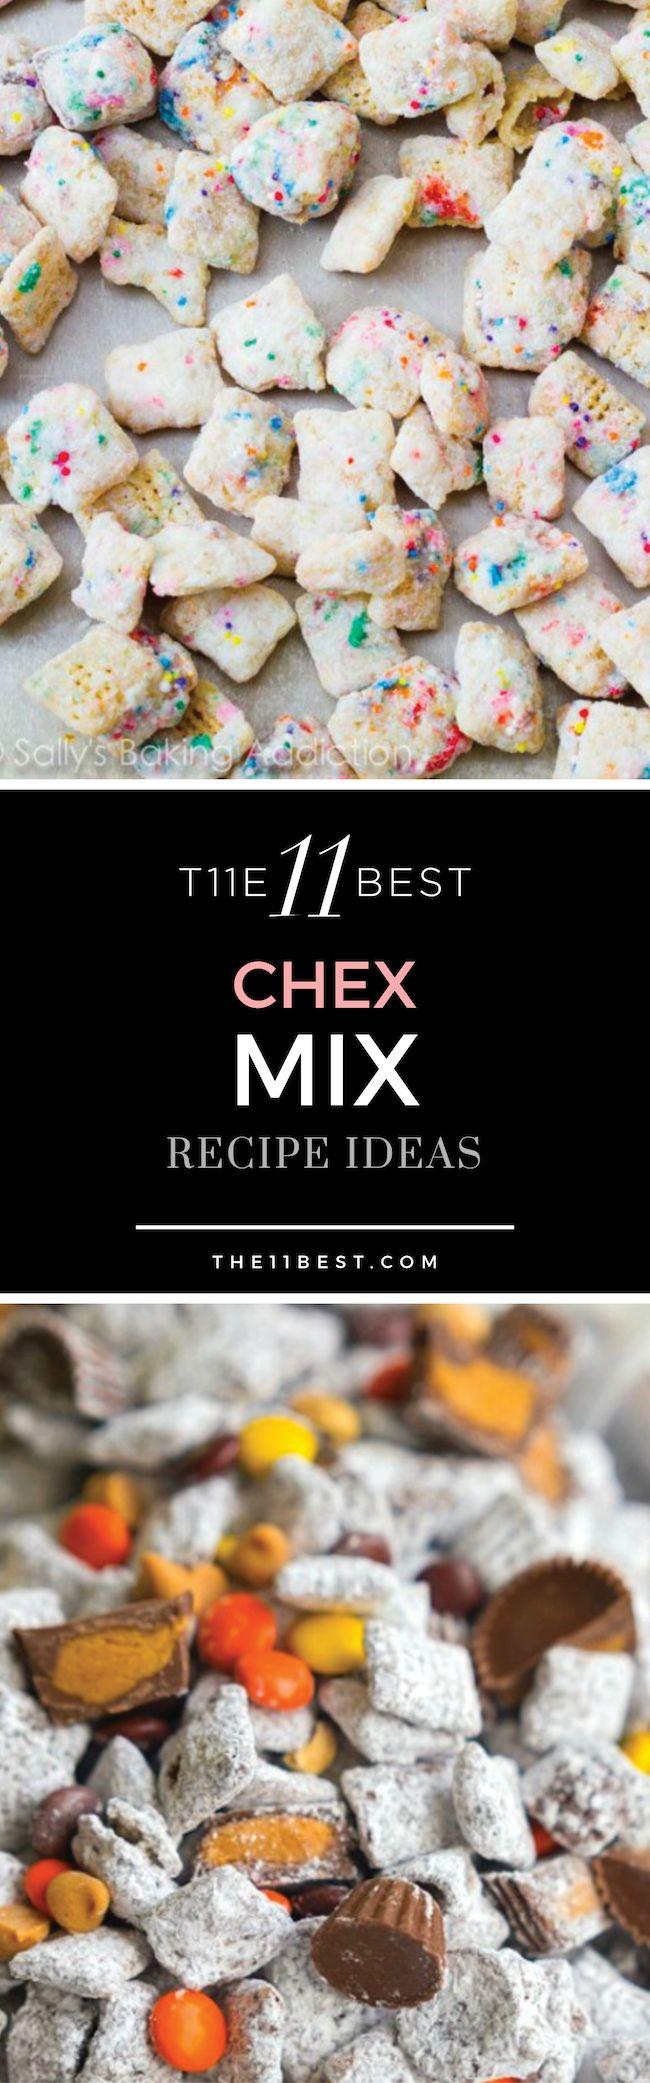 Chex Mix Recipe Ideas (Chex Mix)